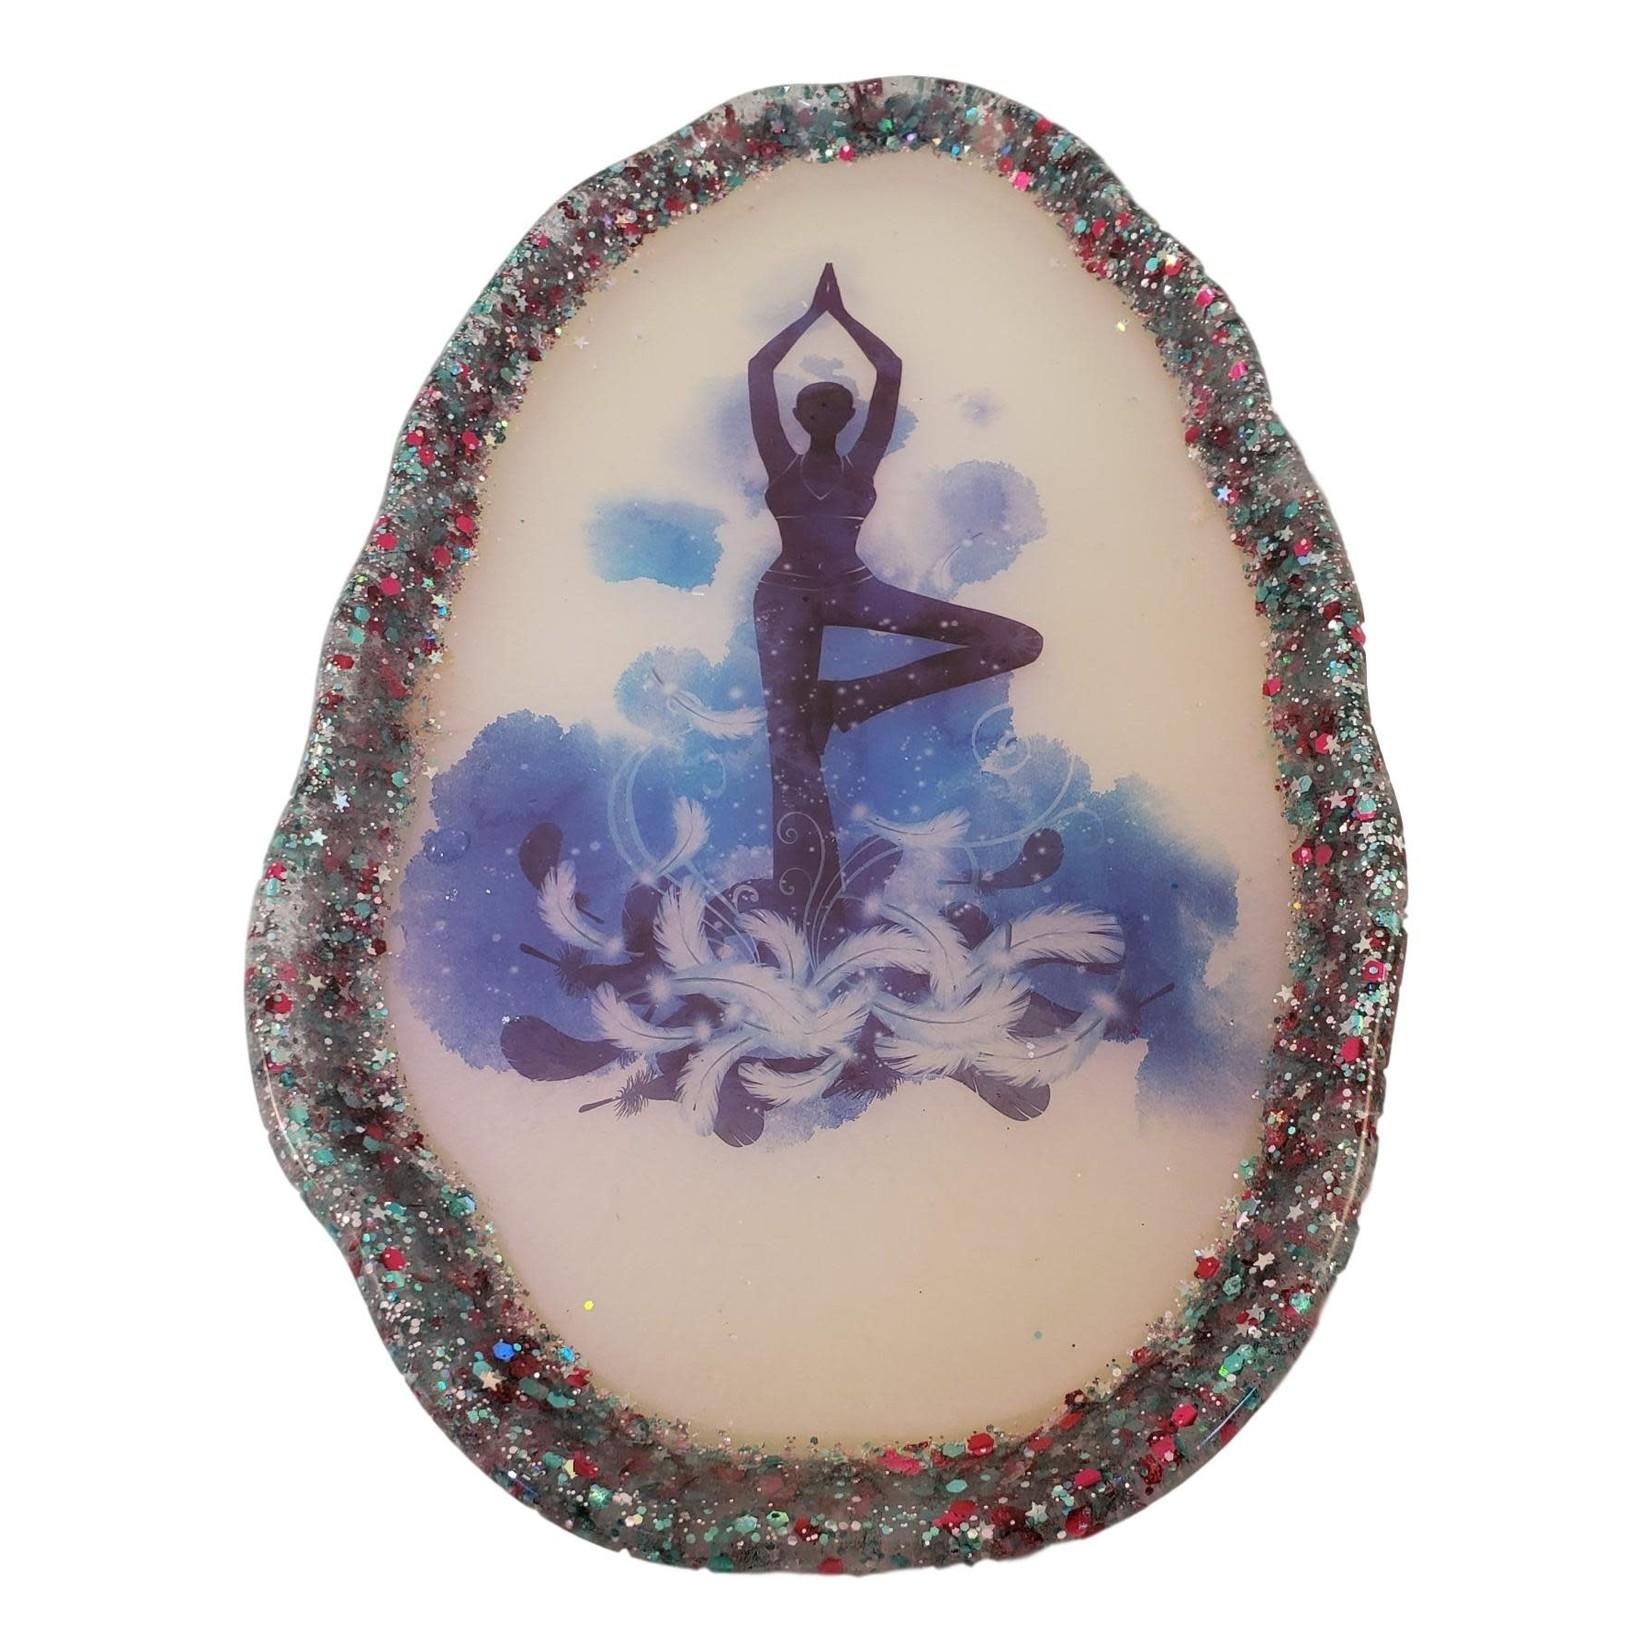 East Coast Sirens Fun & Funky Yoga Pose Rolling / Trinket Tray